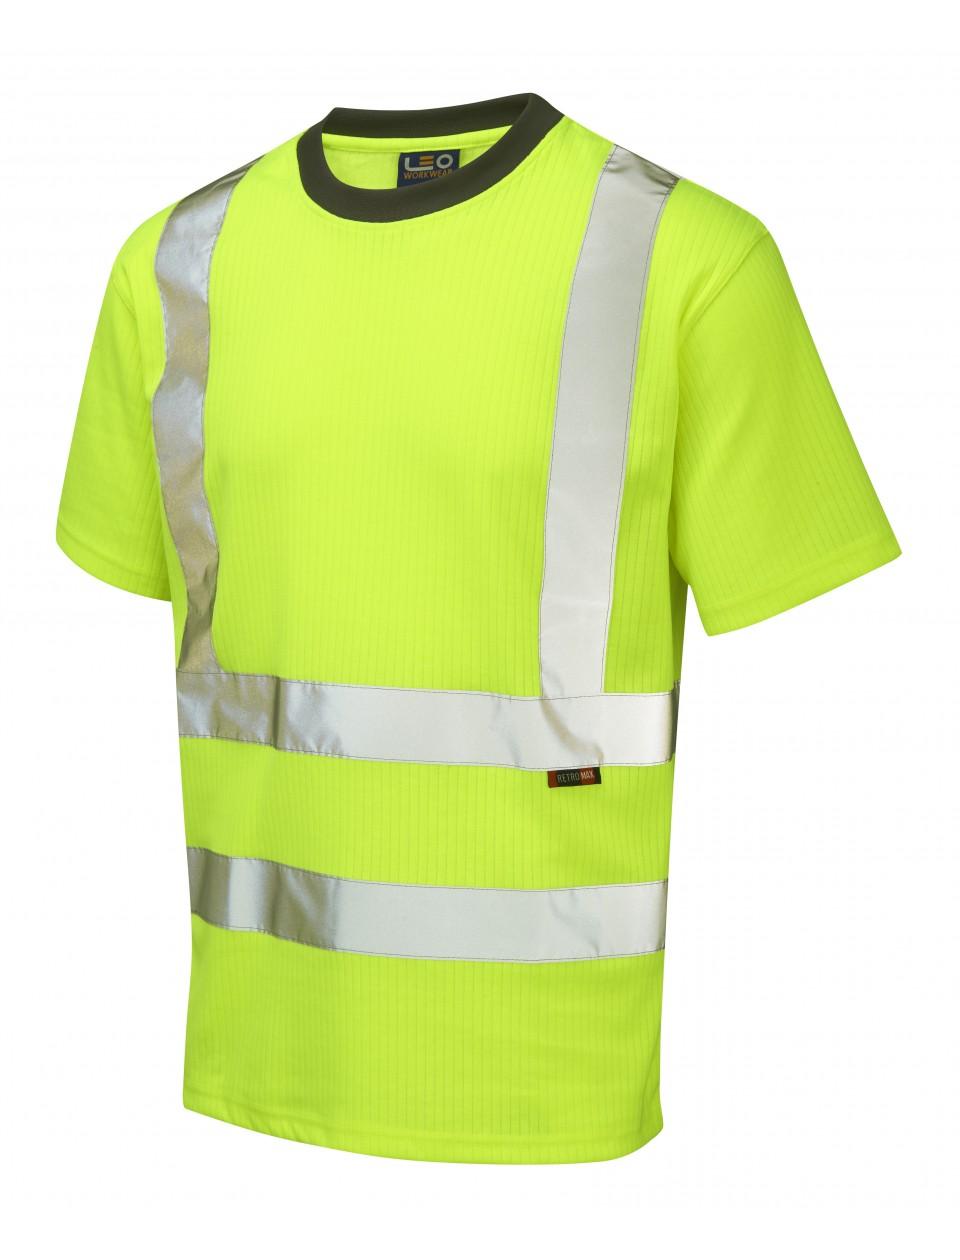 Leo newport comfort polycotton t shirt yellow for Hi vis t shirts cotton